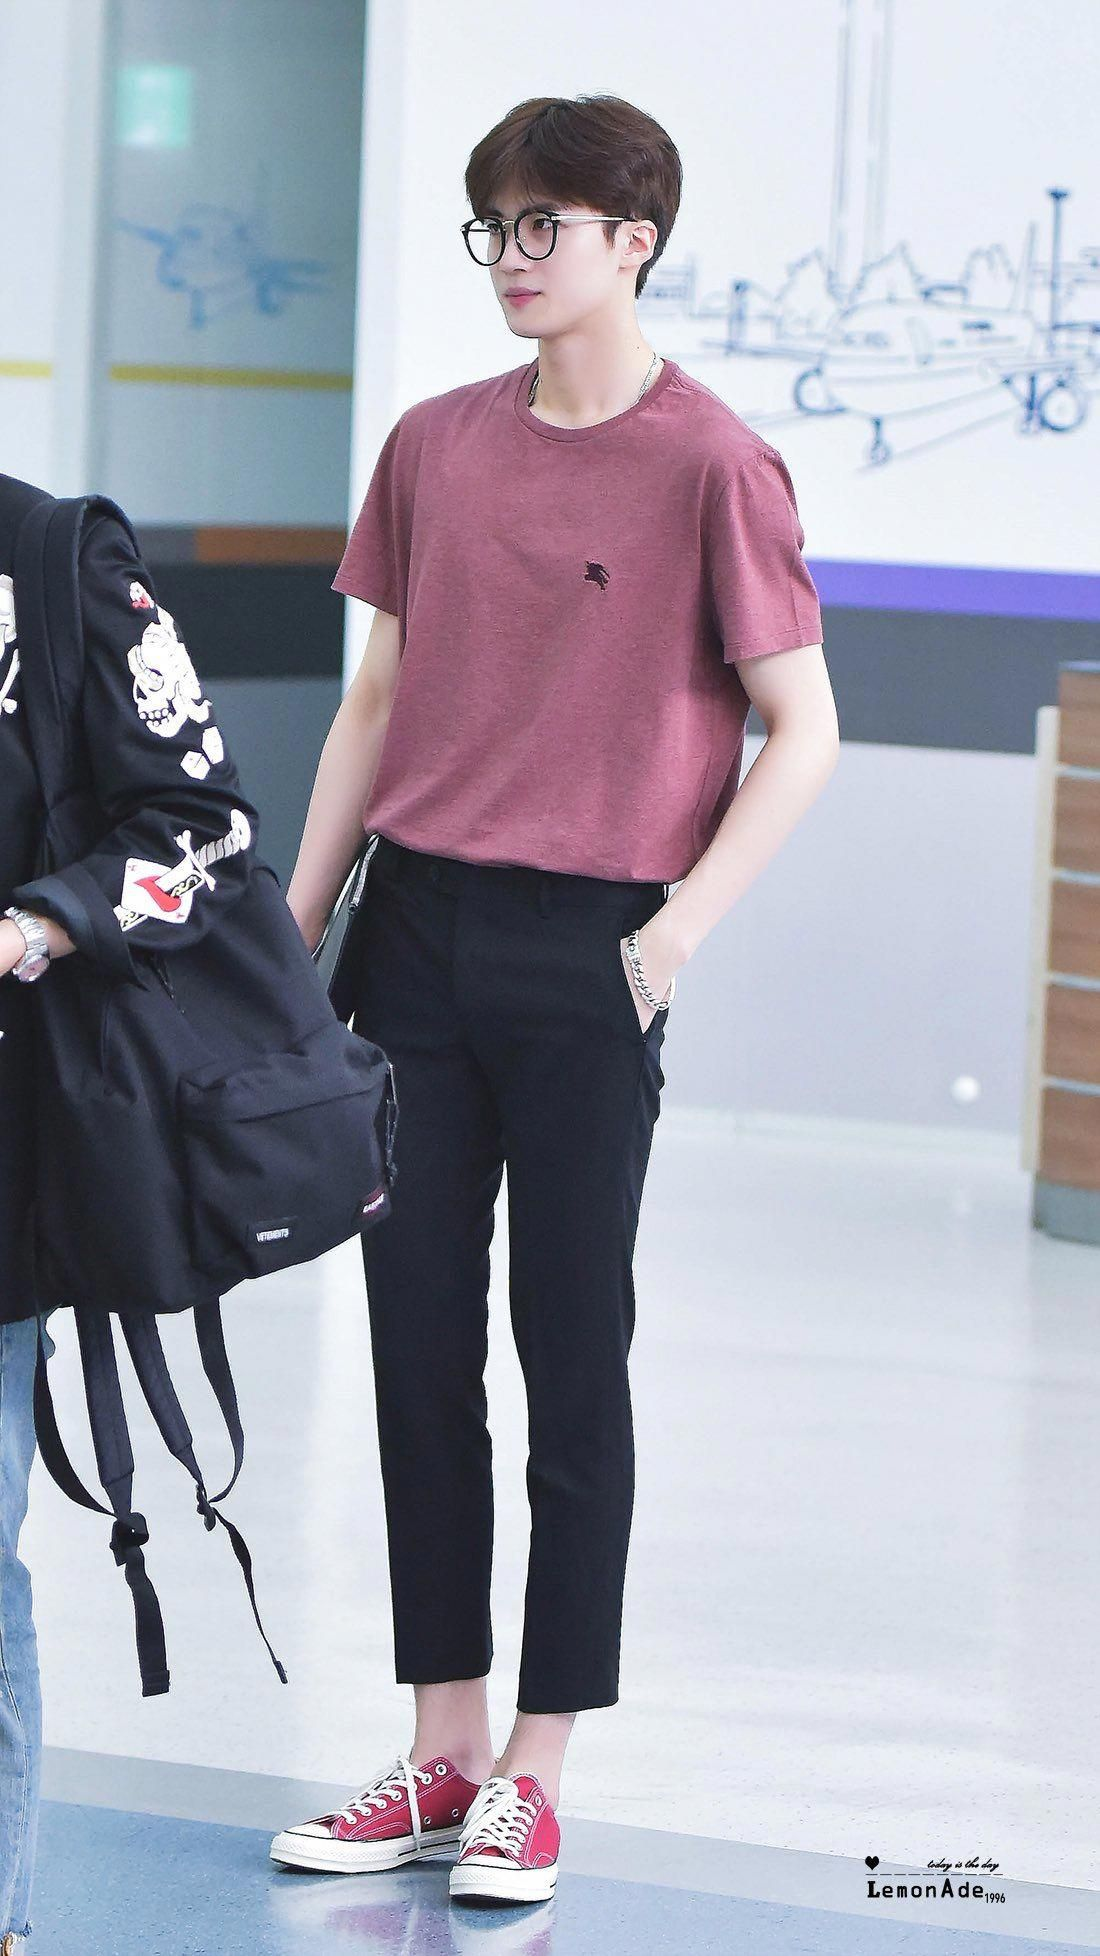 Kpop Clothes Male : clothes, Clothing, Ideas, Korean, Fashion, #koreanfashionideas, Casual, Outfits